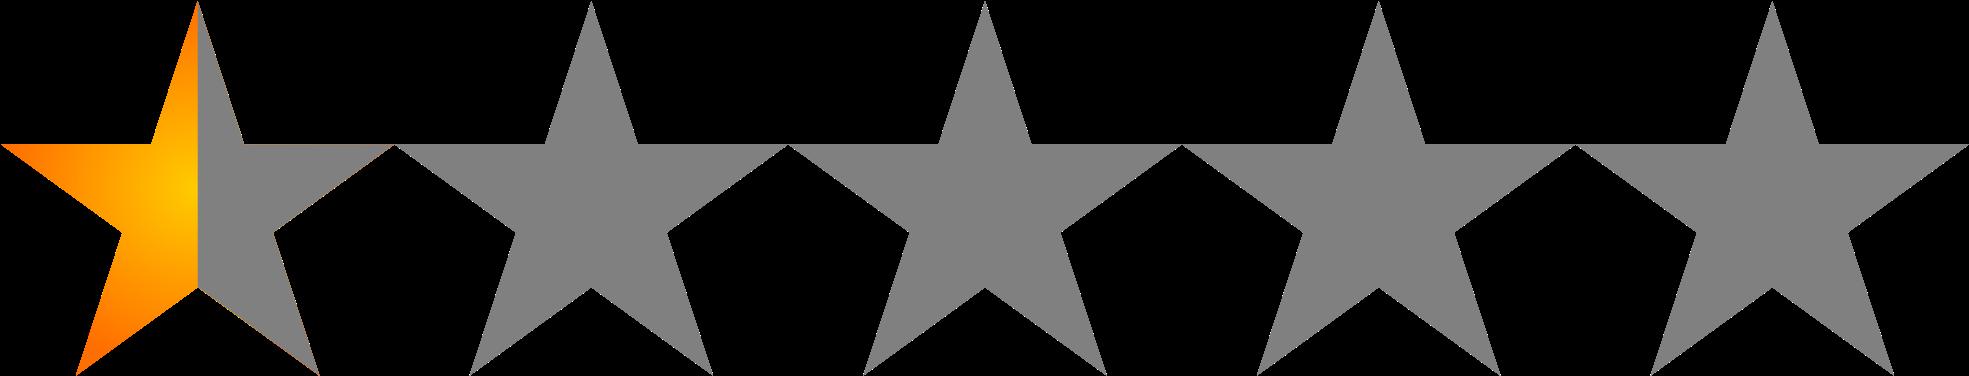 Free 5 Stars Transparent Background, Download Free Clip Art.